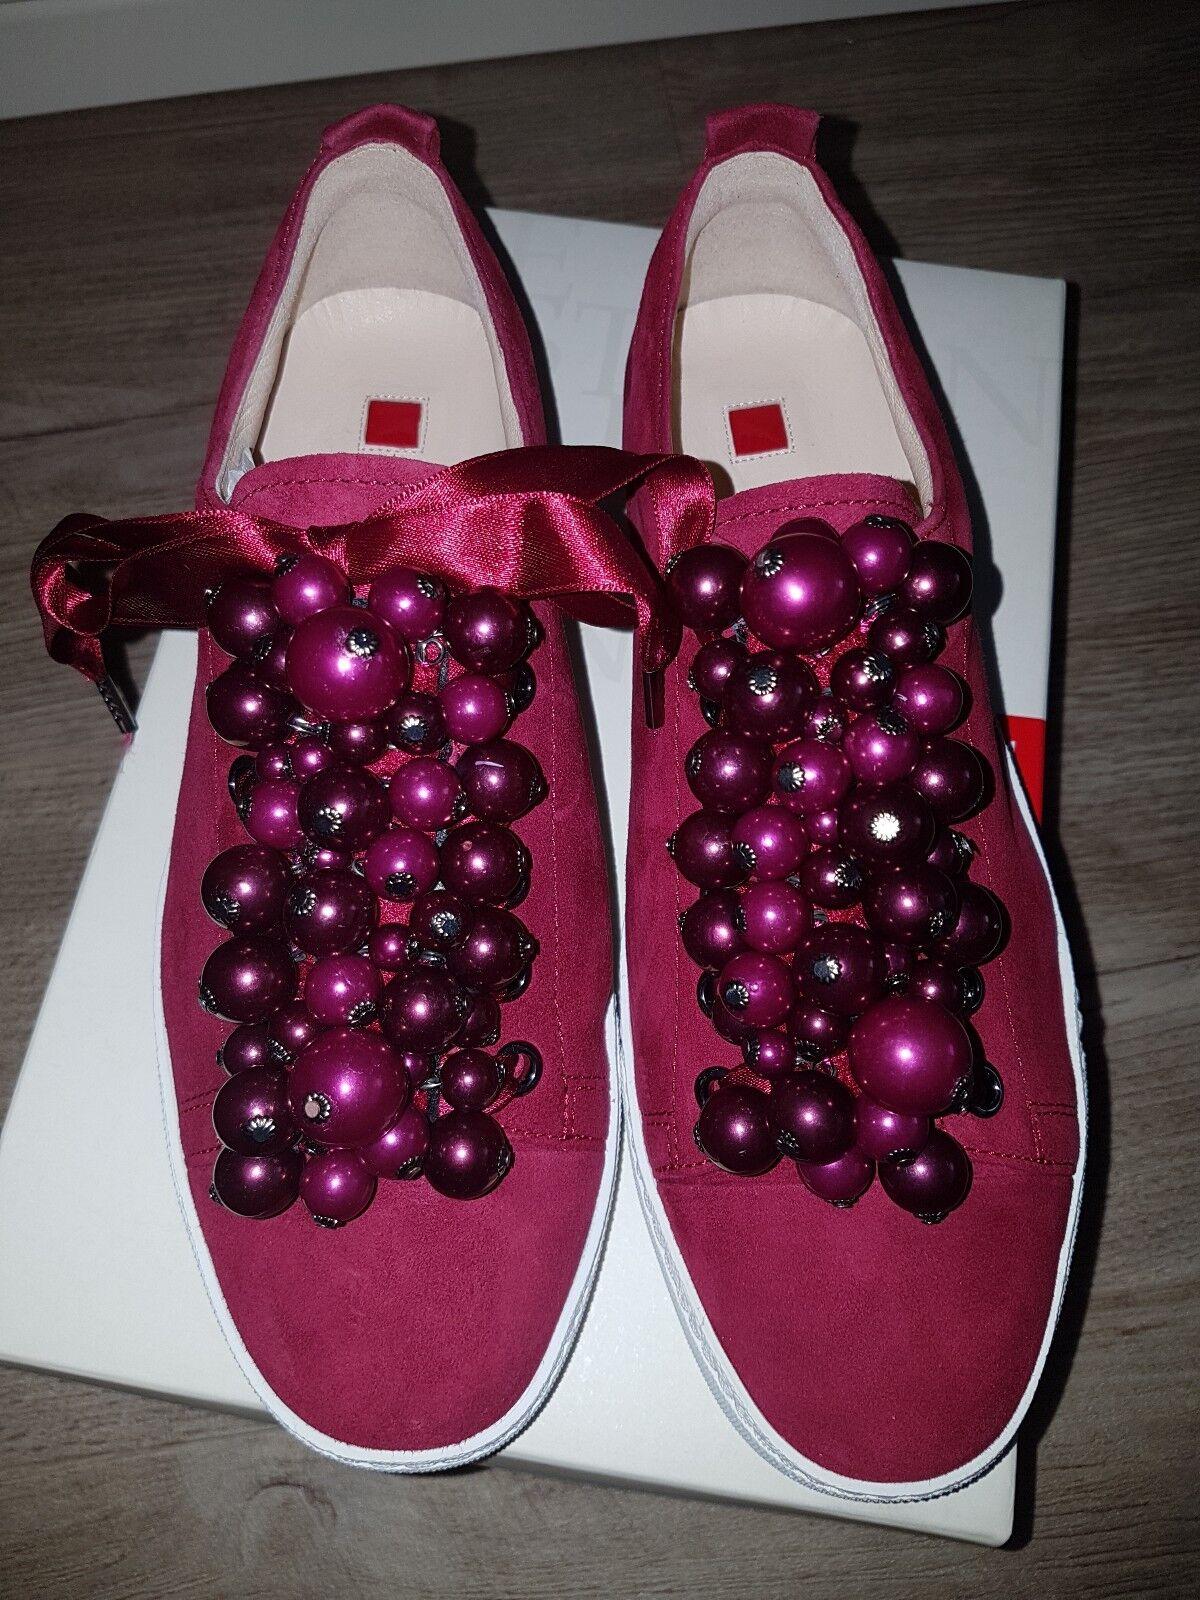 Högl Damen Sneaker pink/beerenton mit Perlen, Wildleder Gr. 36, NEU, NP 160 Euro